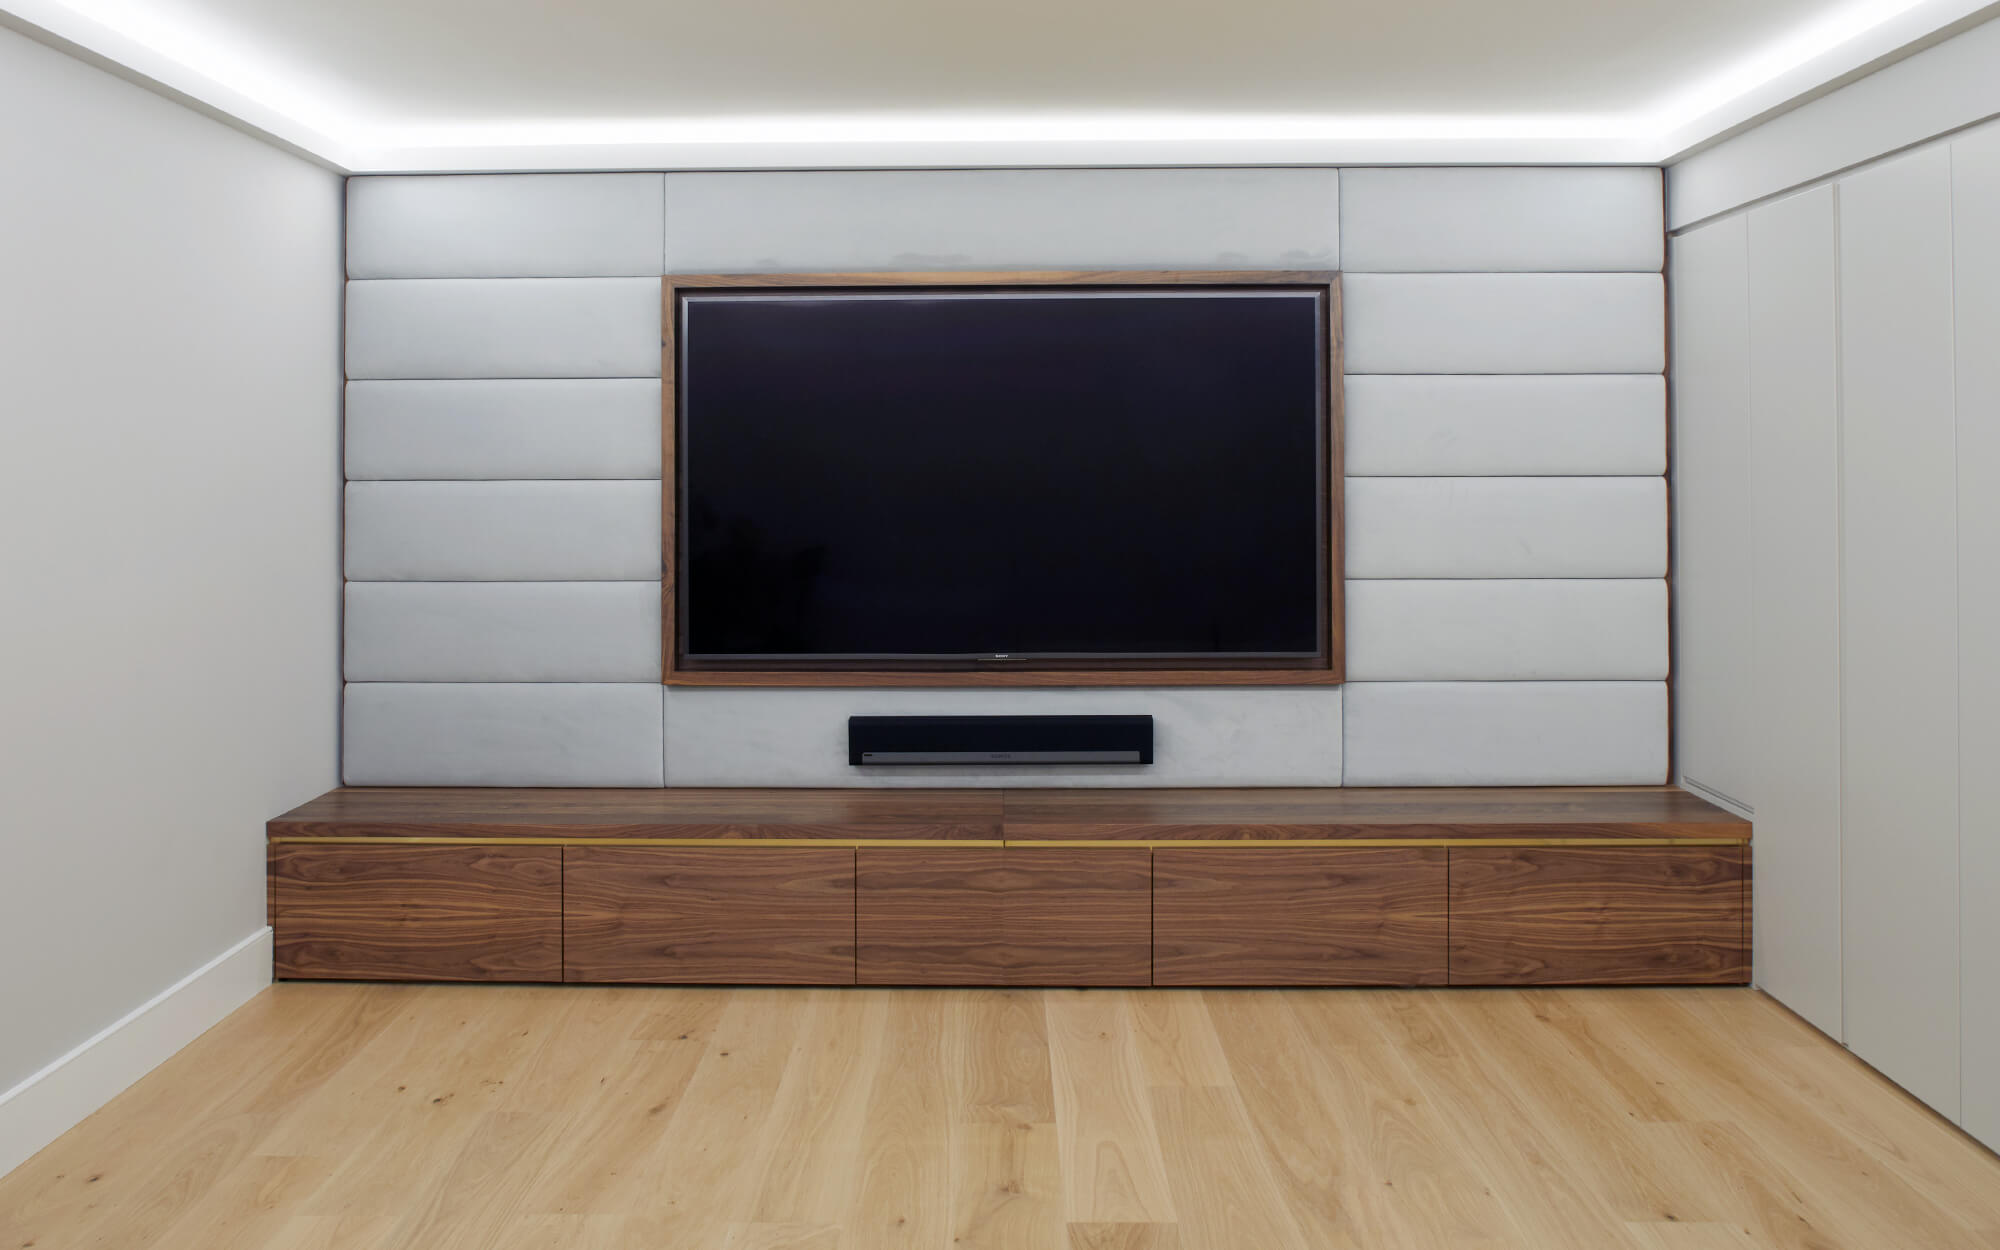 Ultimate cinema room cabinetry by Splinterworks